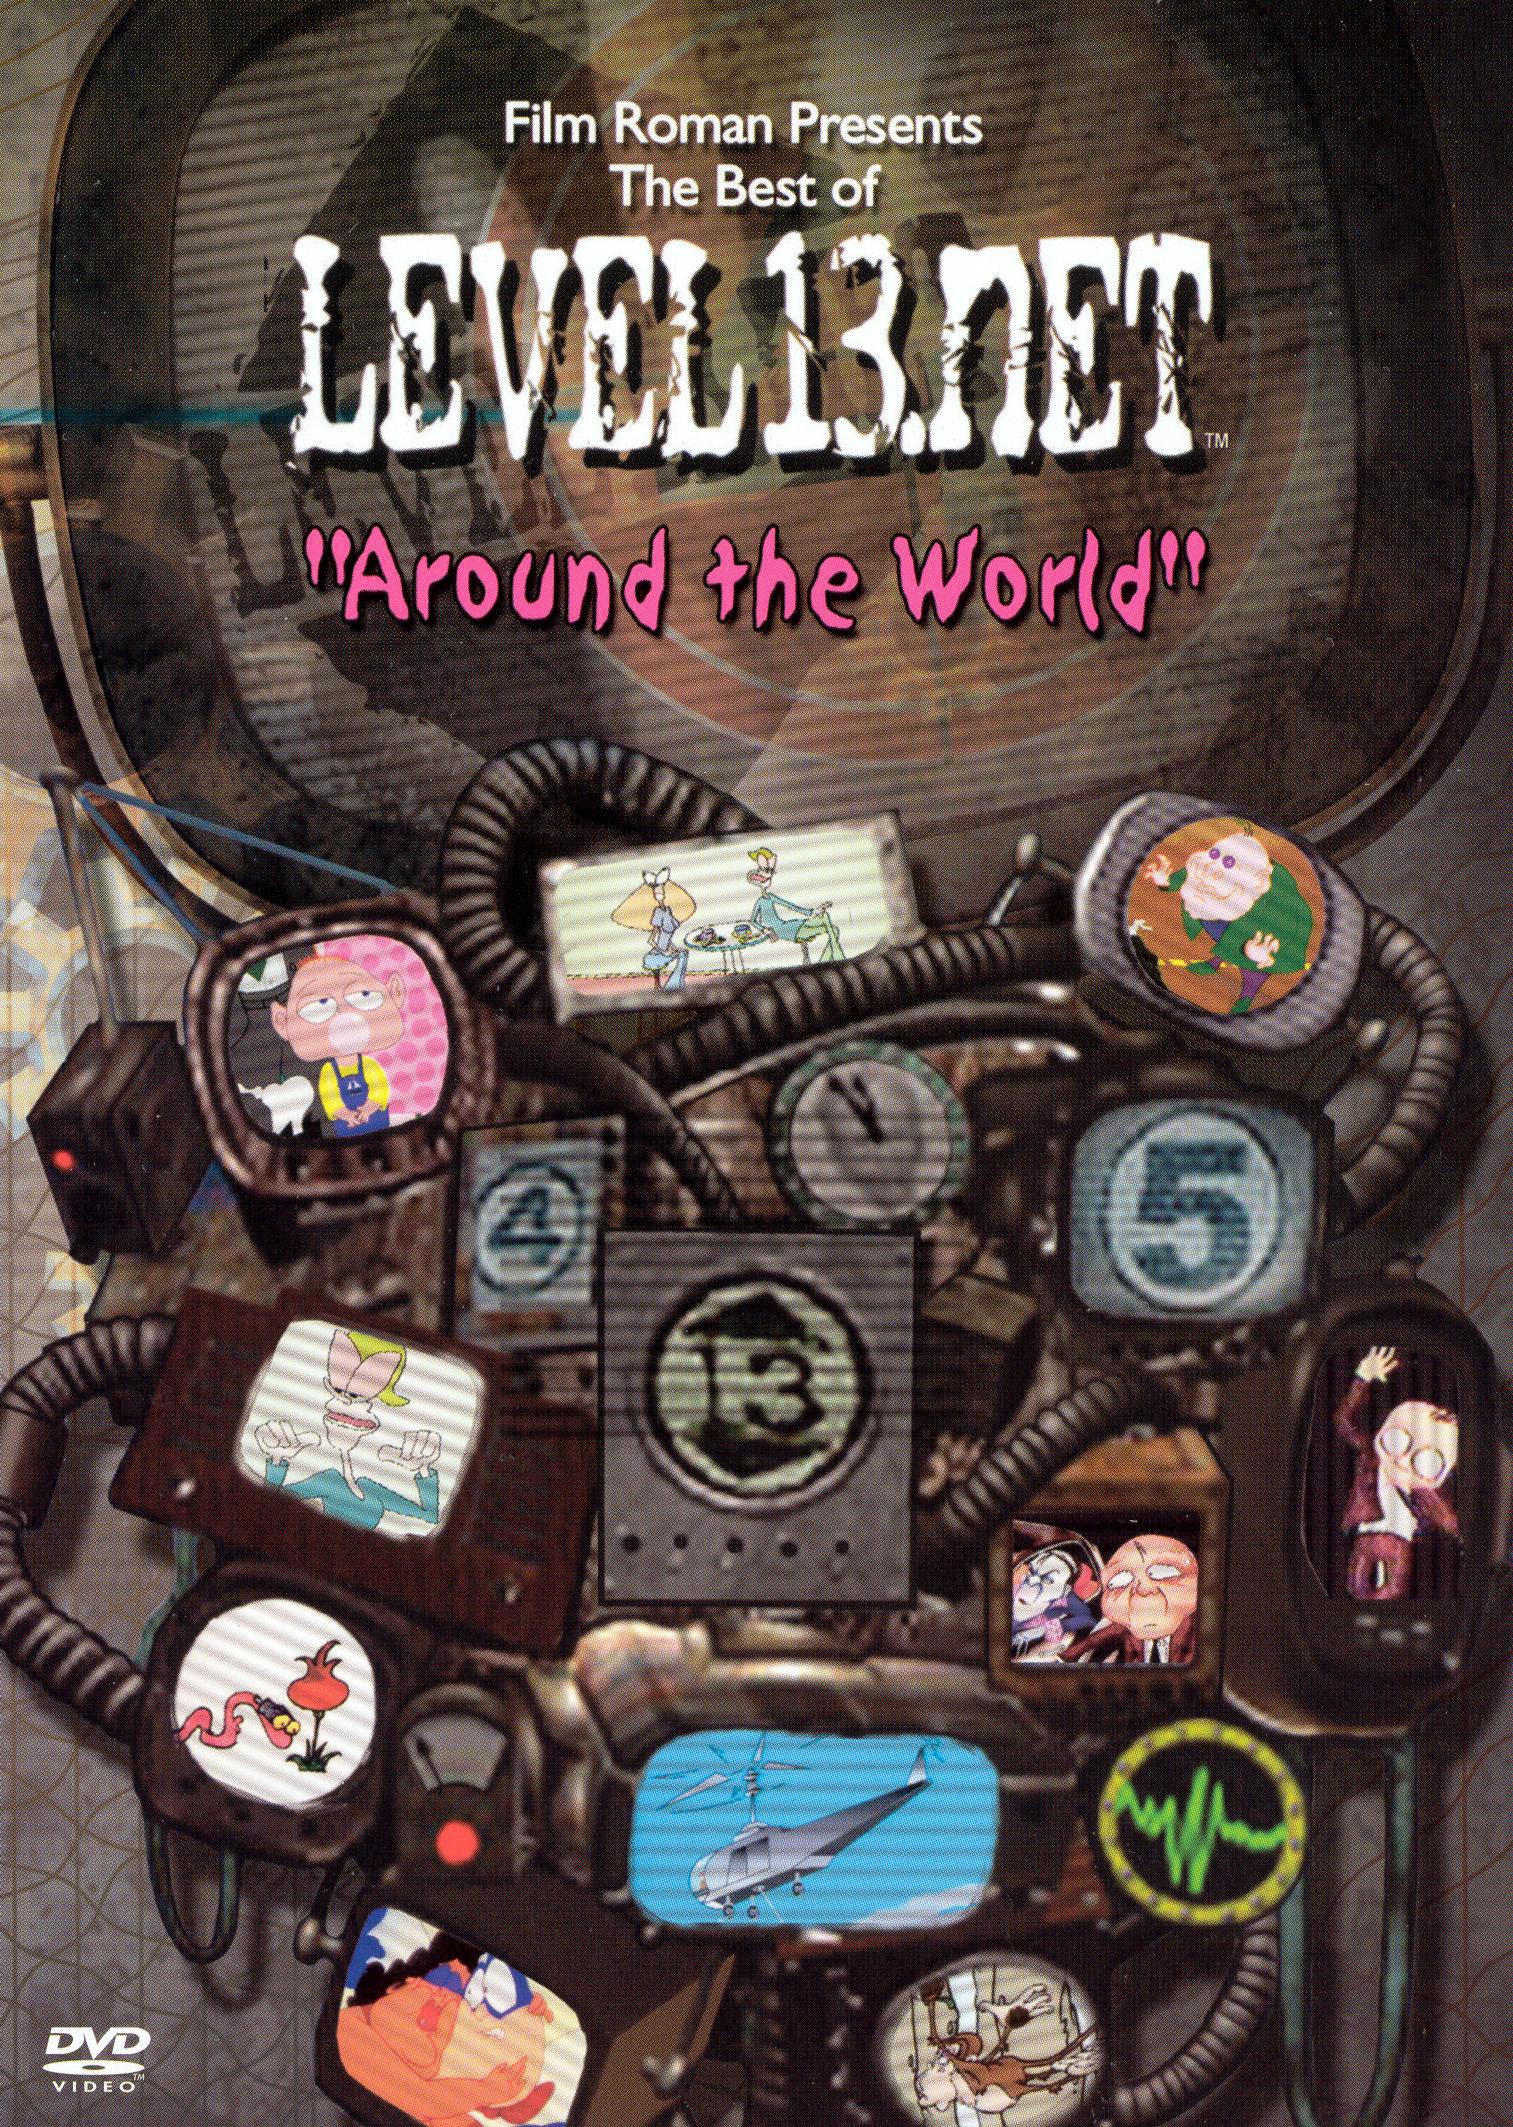 Level 13.net: Around the World